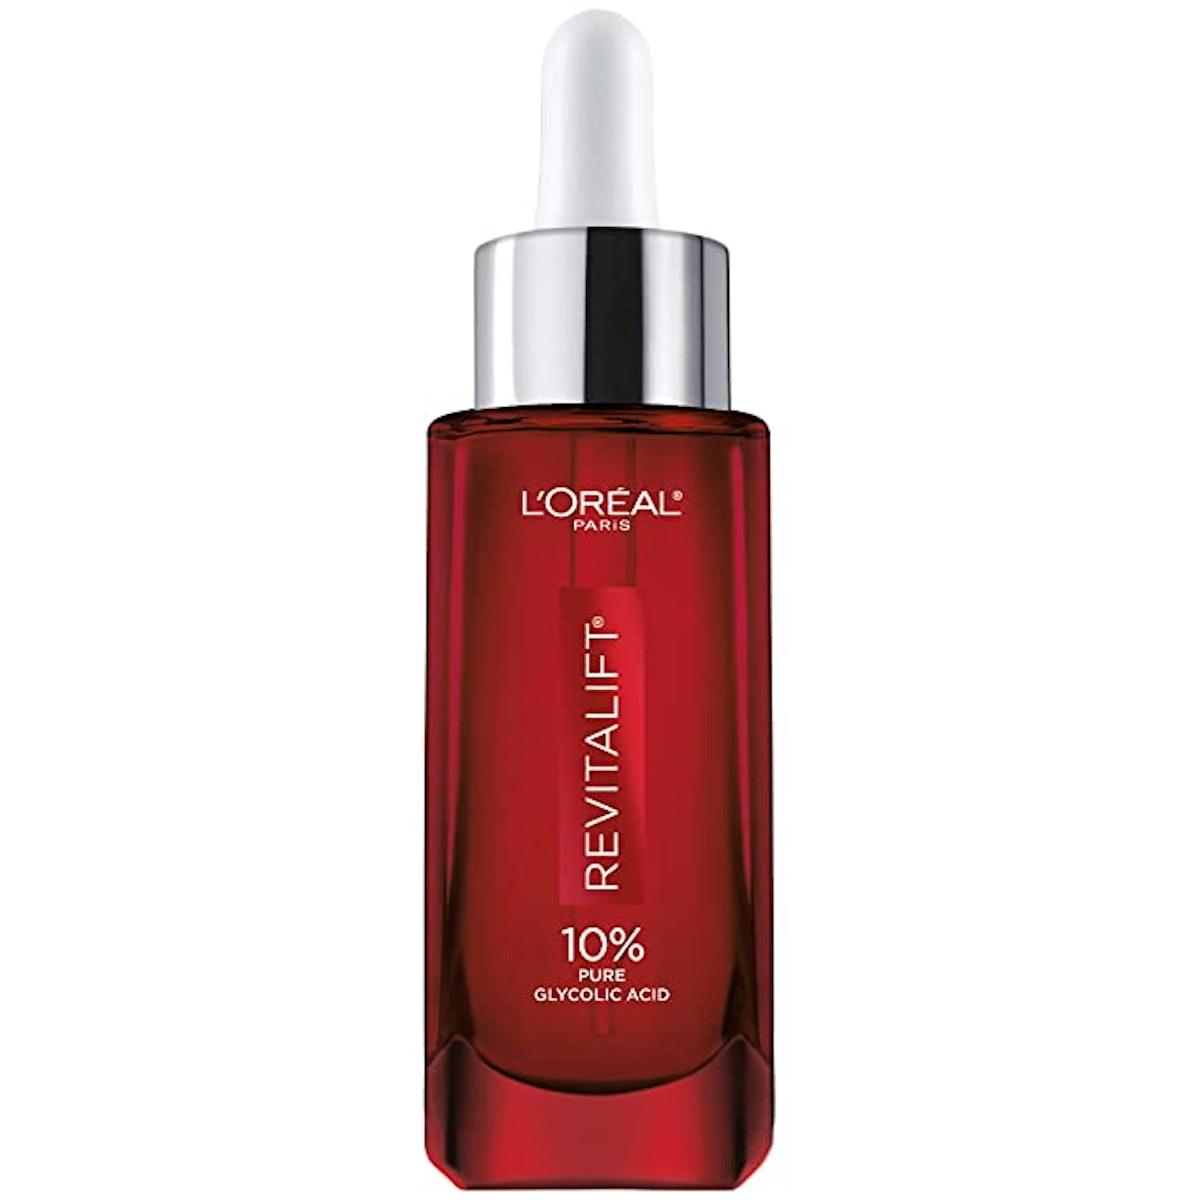 L'Oreal Paris Revitalift 10% Pure Glycolic Acid Serum